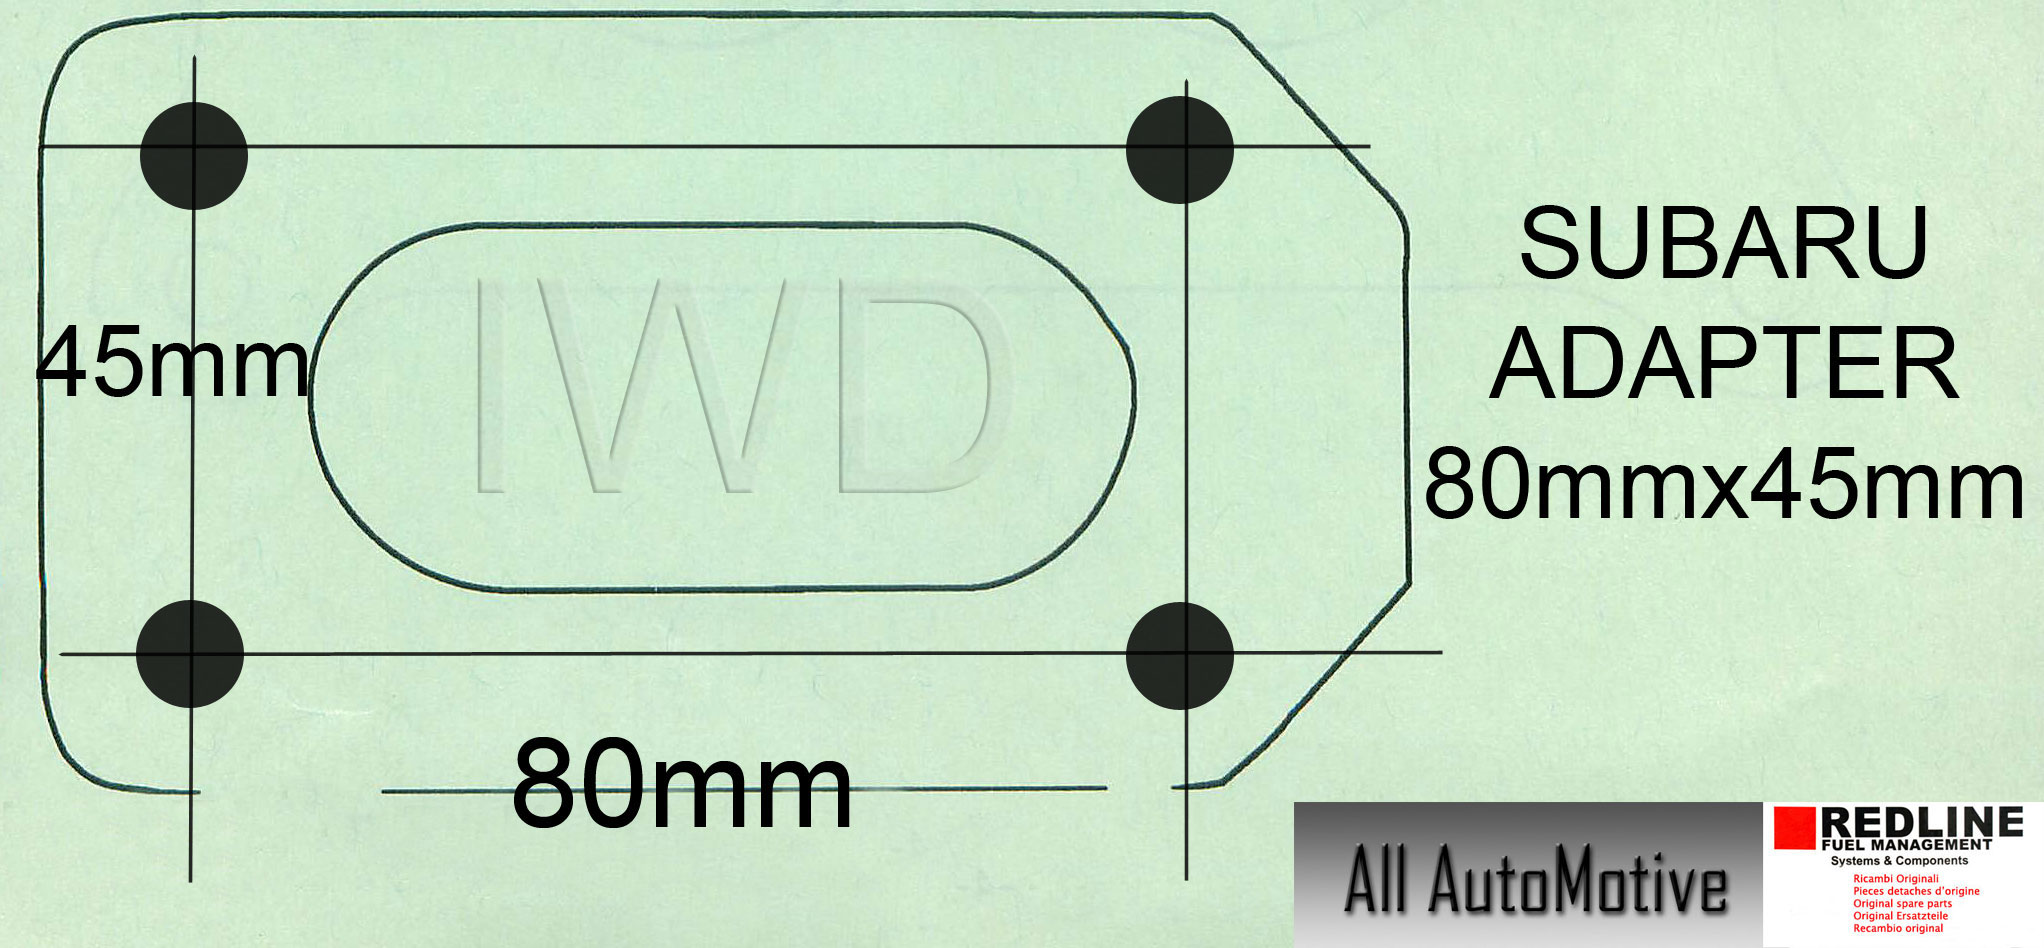 Ea82 Intake Diagram Detailed Schematics Engine Subaru 1985 1987 1 8l Ohc Weber Carburetor Adapter To Stock Air Cooled Volkswagen